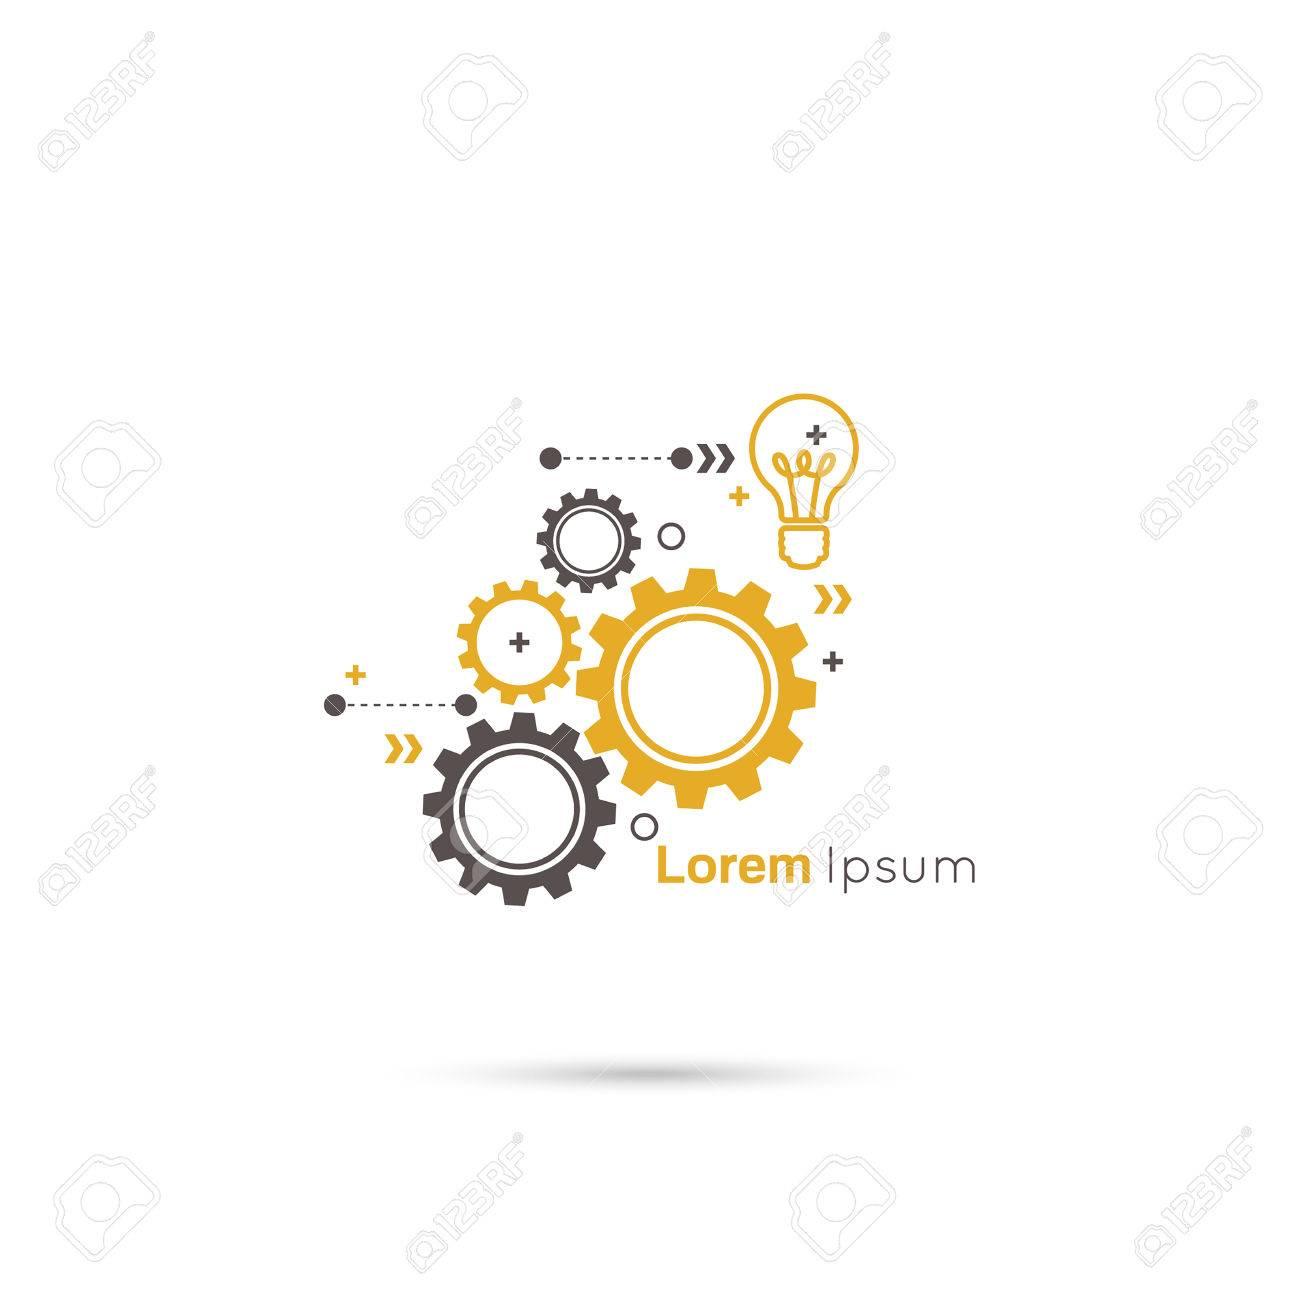 Großzügig Lasttrennschalter Symbol Ideen - Schaltplan Serie Circuit ...